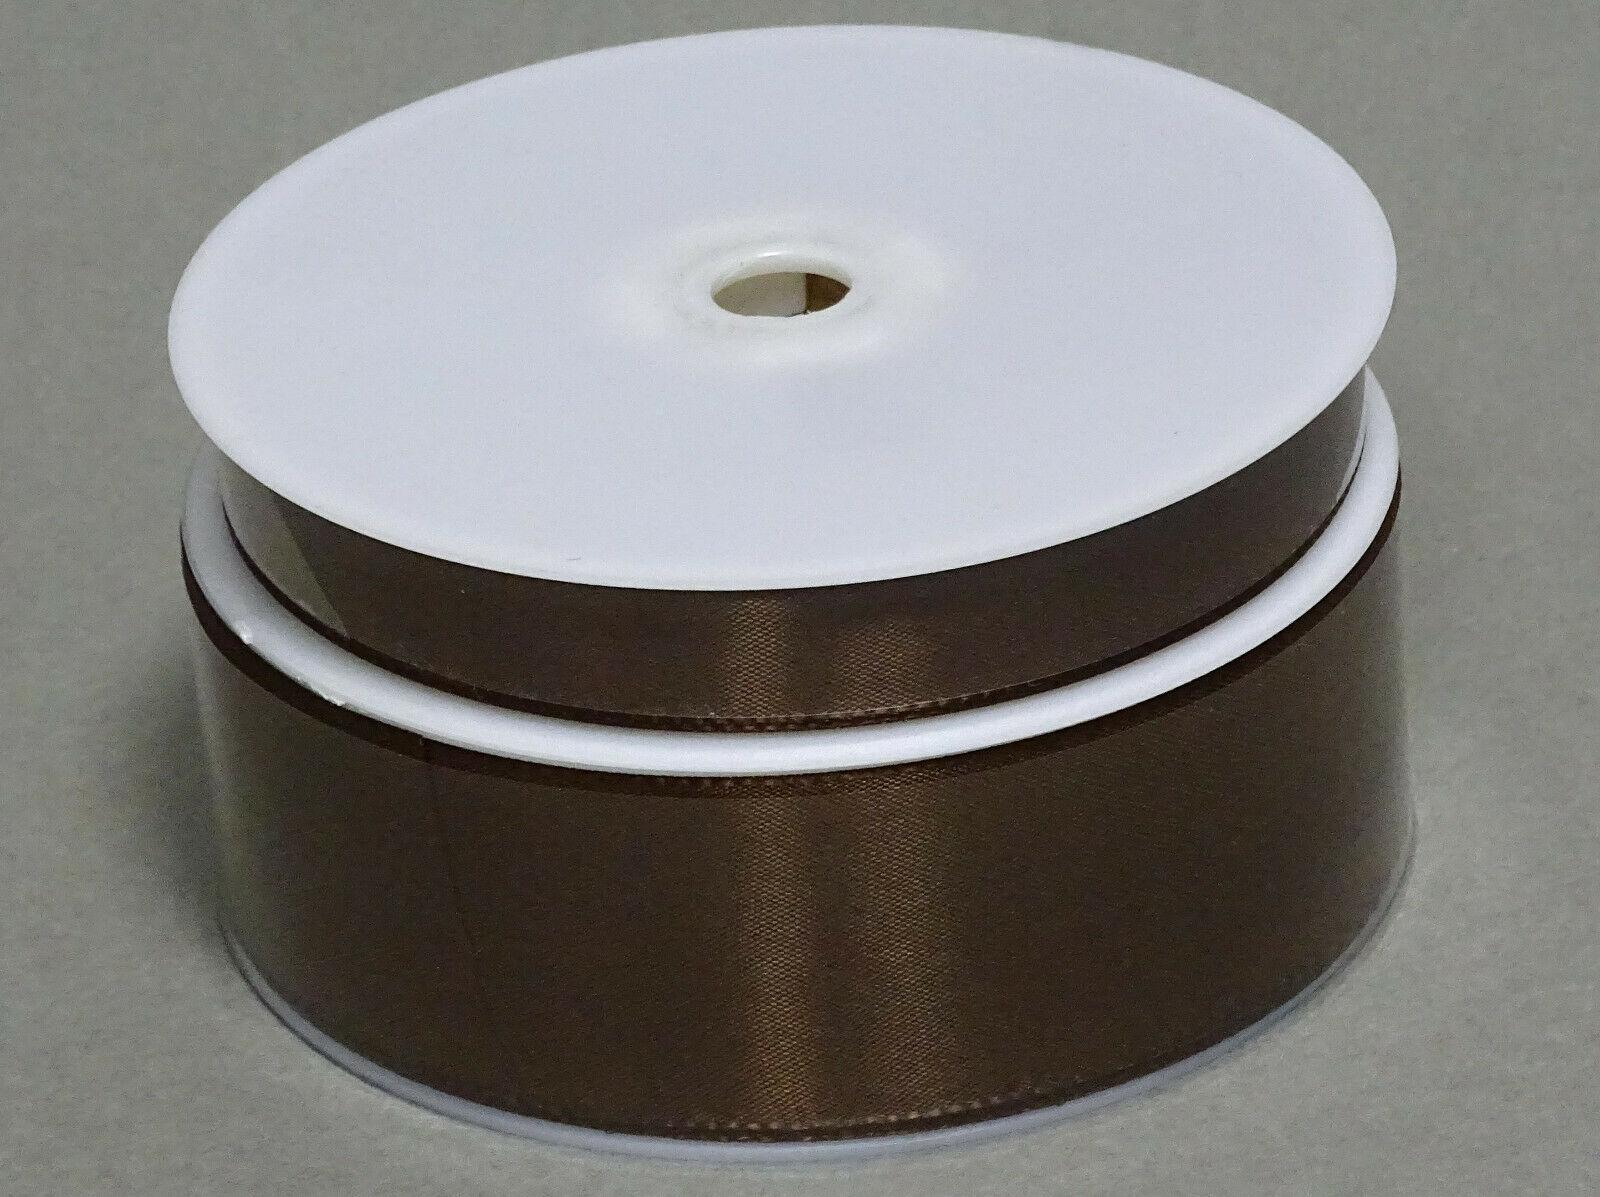 Seidenband Schleifenband 50 m x 15 / 25 / 40mm Dekoband ab 0,08€/m Geschenkband  - Braun 132, 25 mm x 50 m